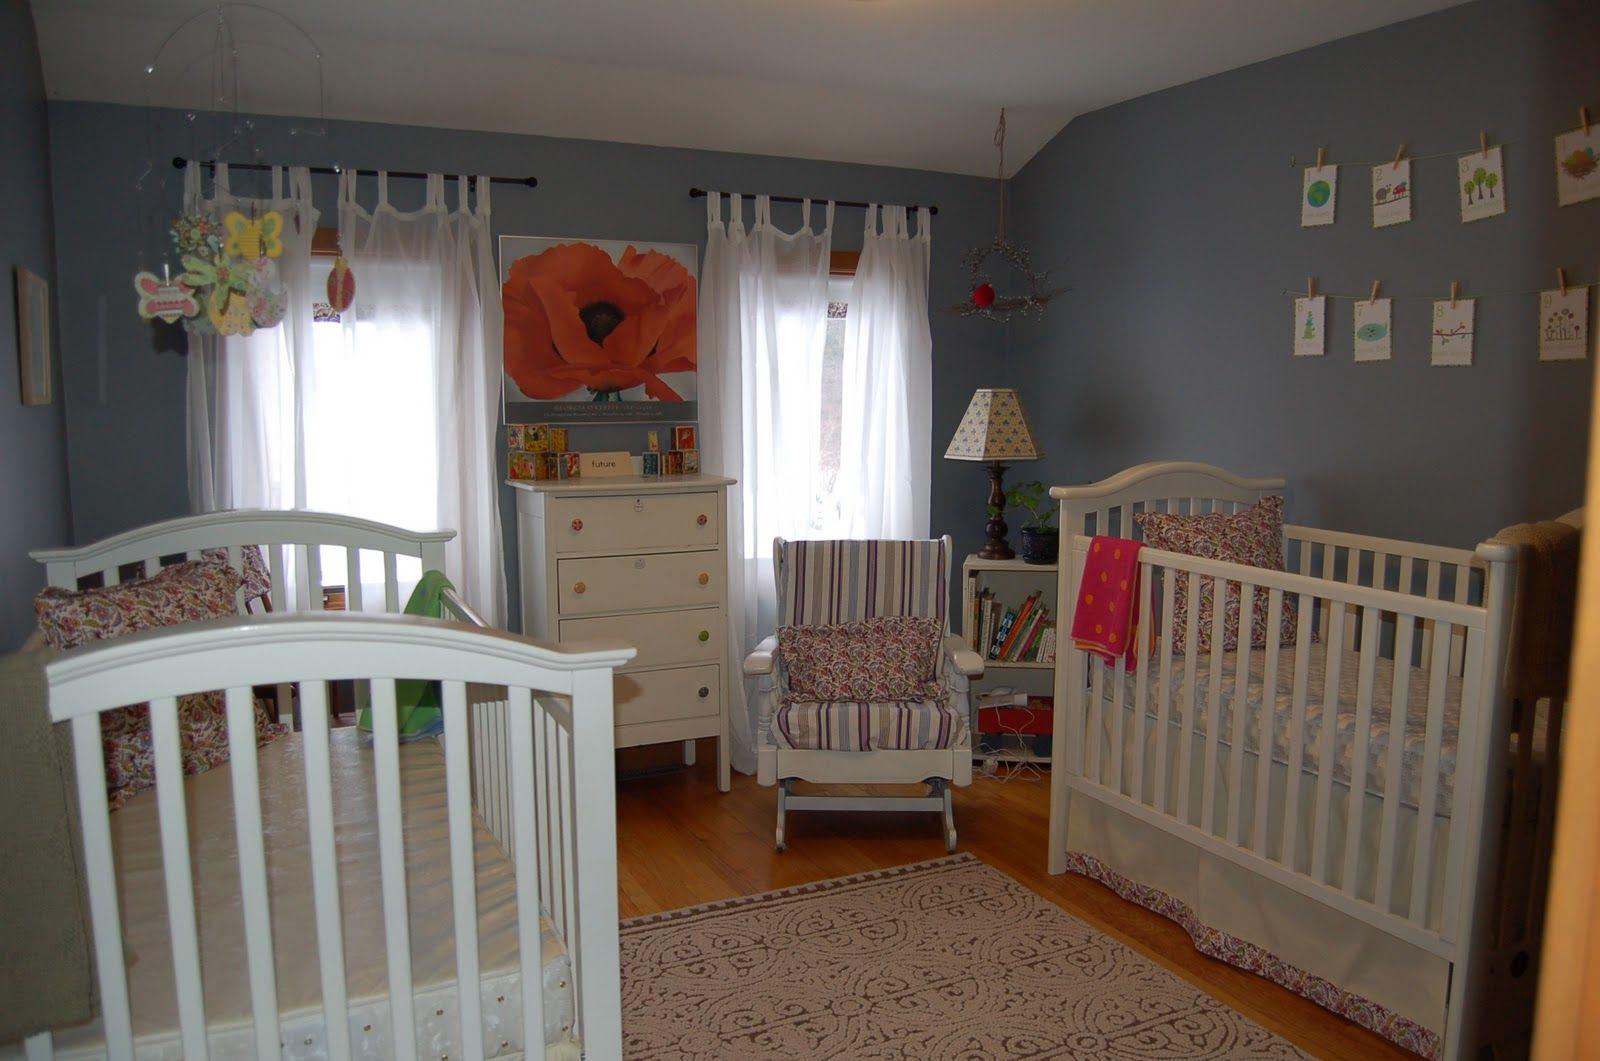 Park Art|My WordPress Blog_How To Dress Baby In 70 Degree Room